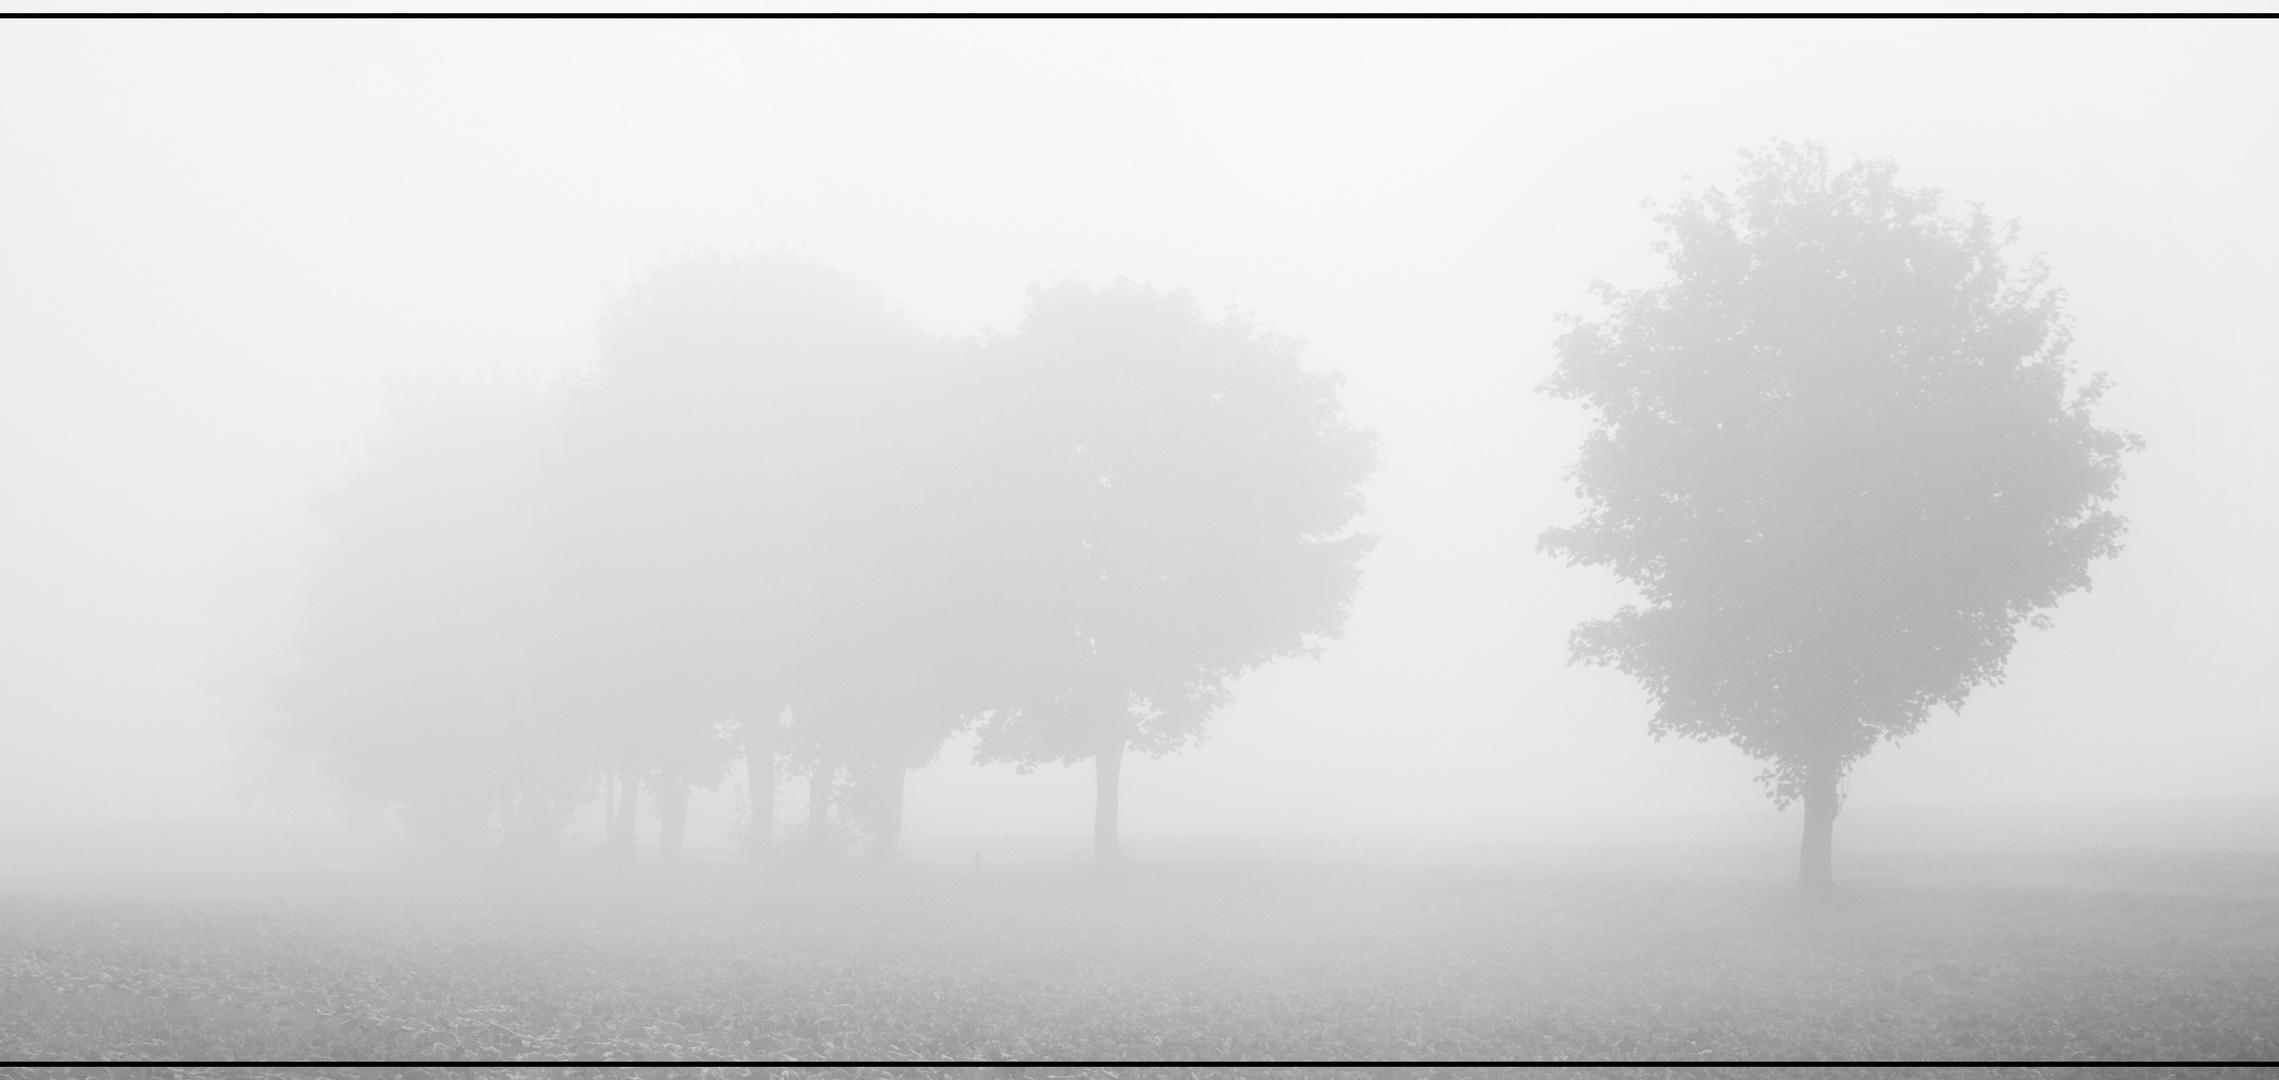 Nebelung